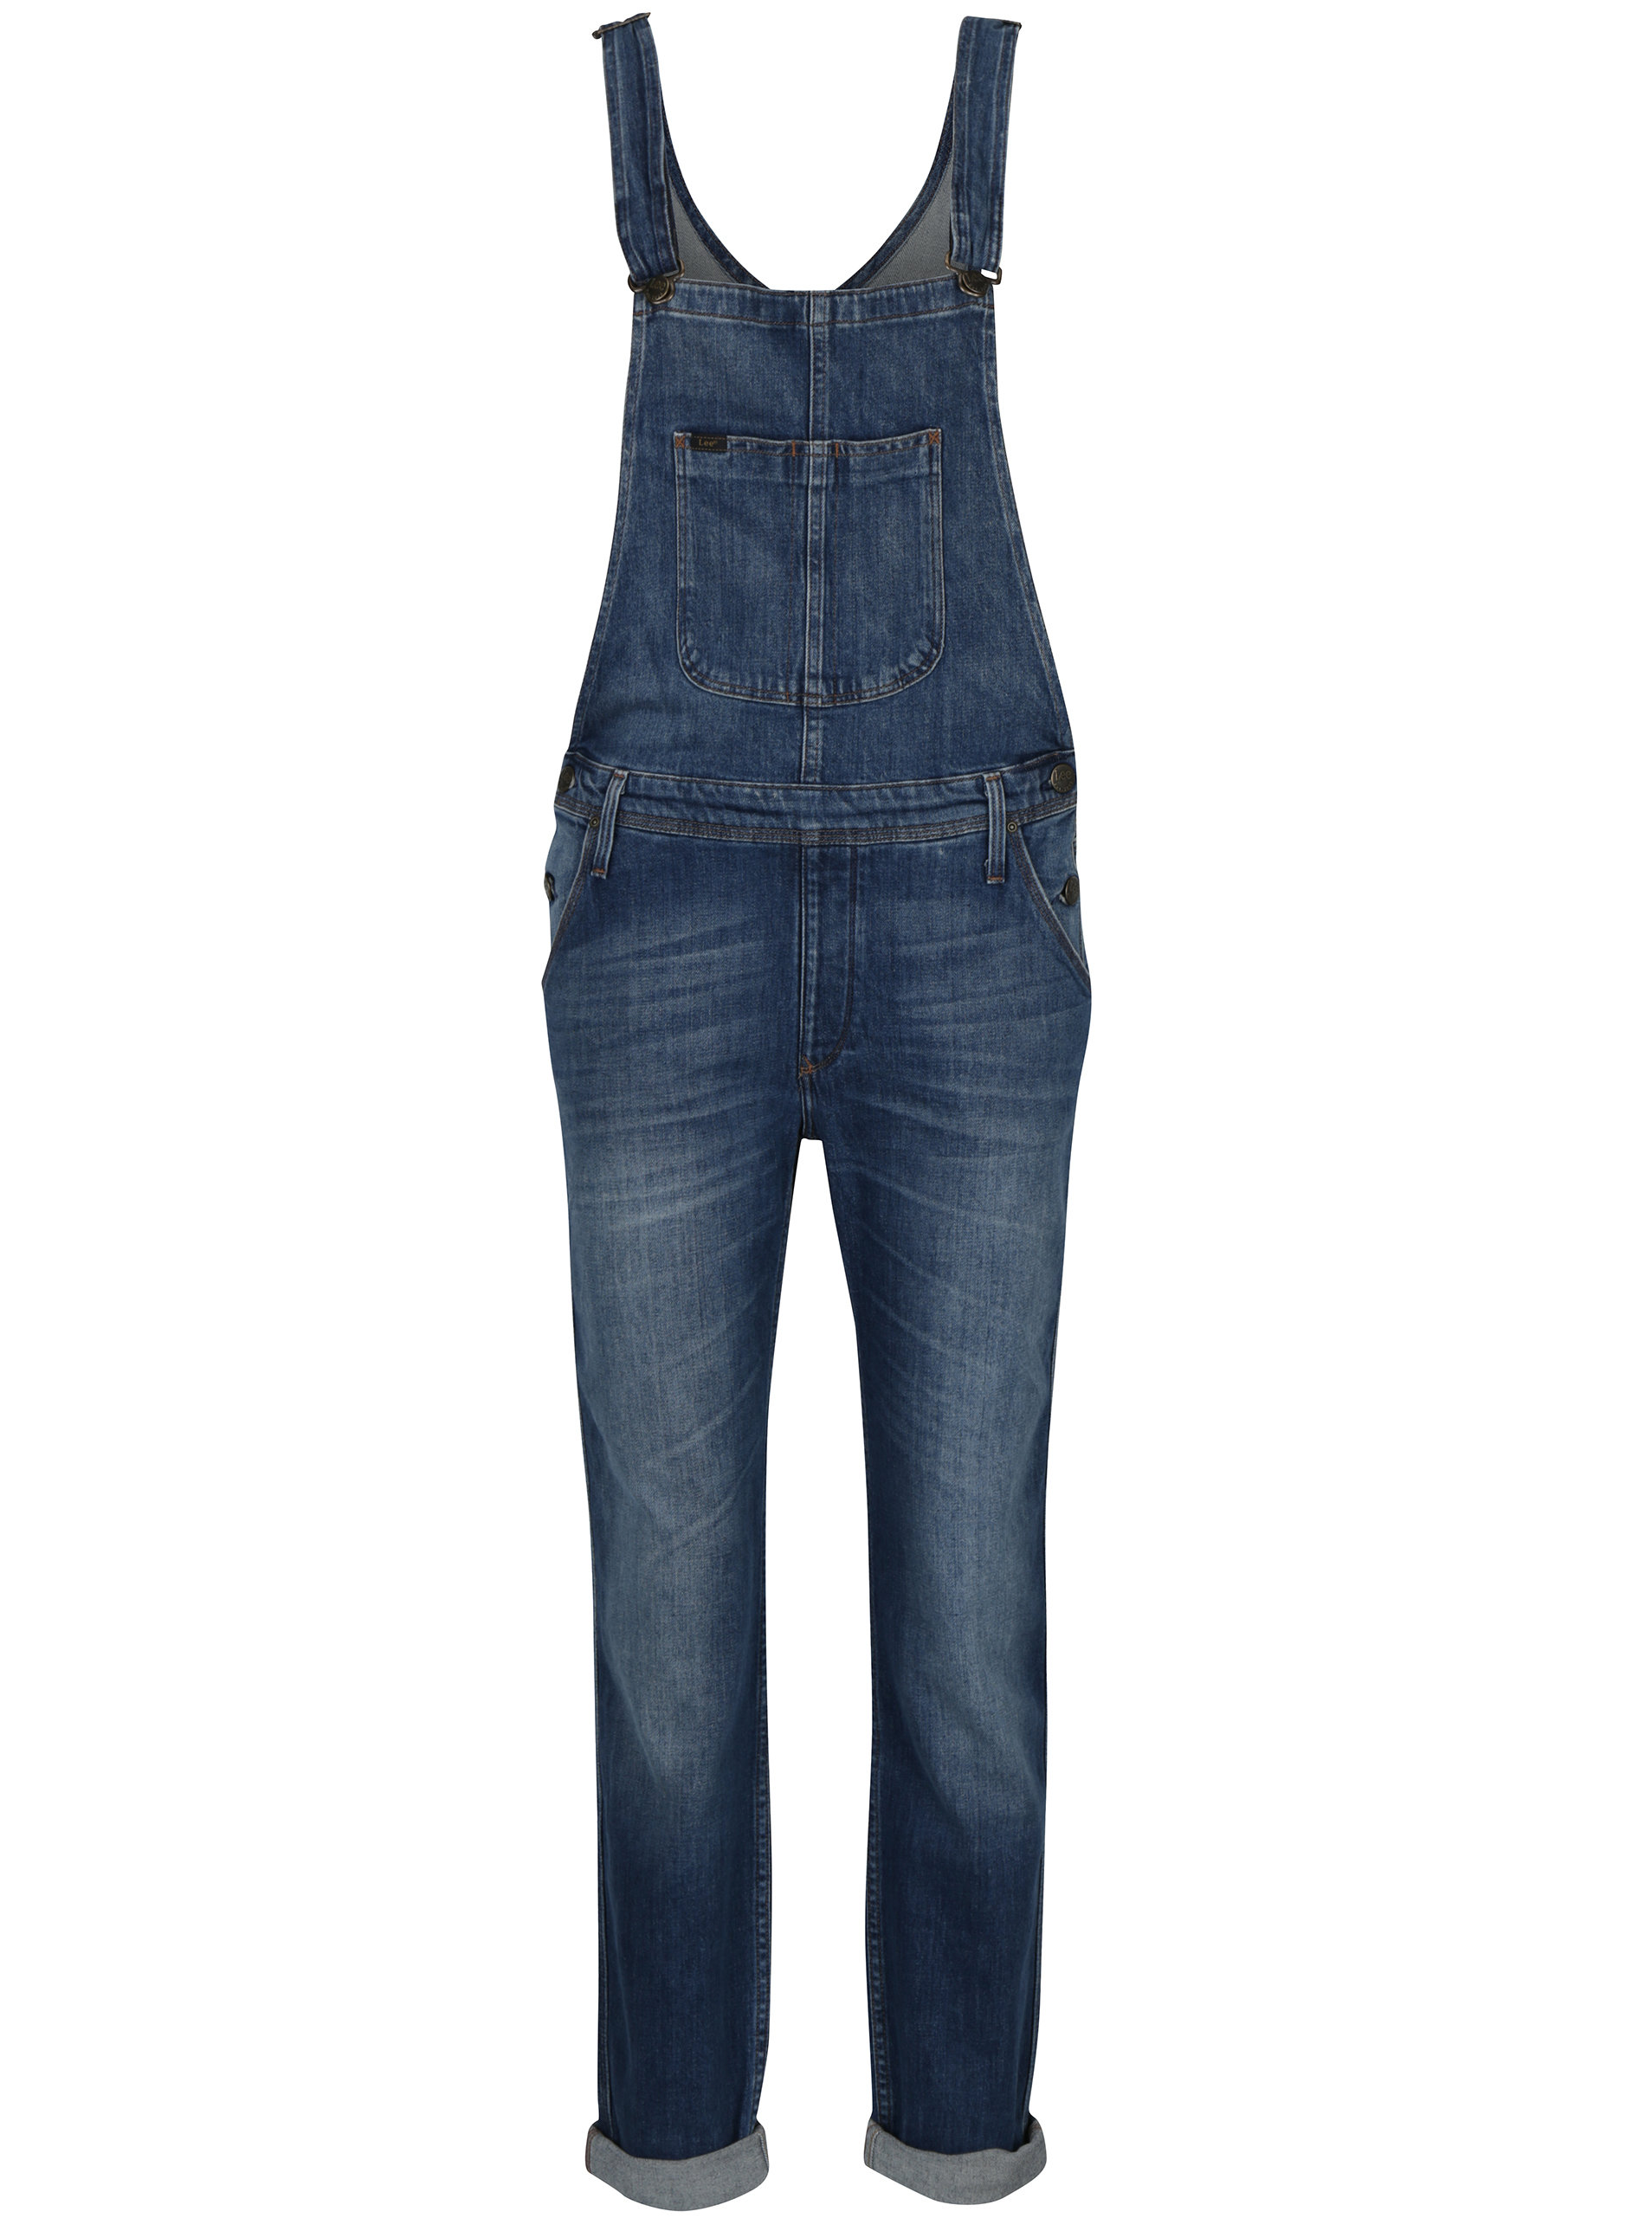 4938017fc278 Modré dámske rifľové nohavice s trakmi Lee Chelsea ...